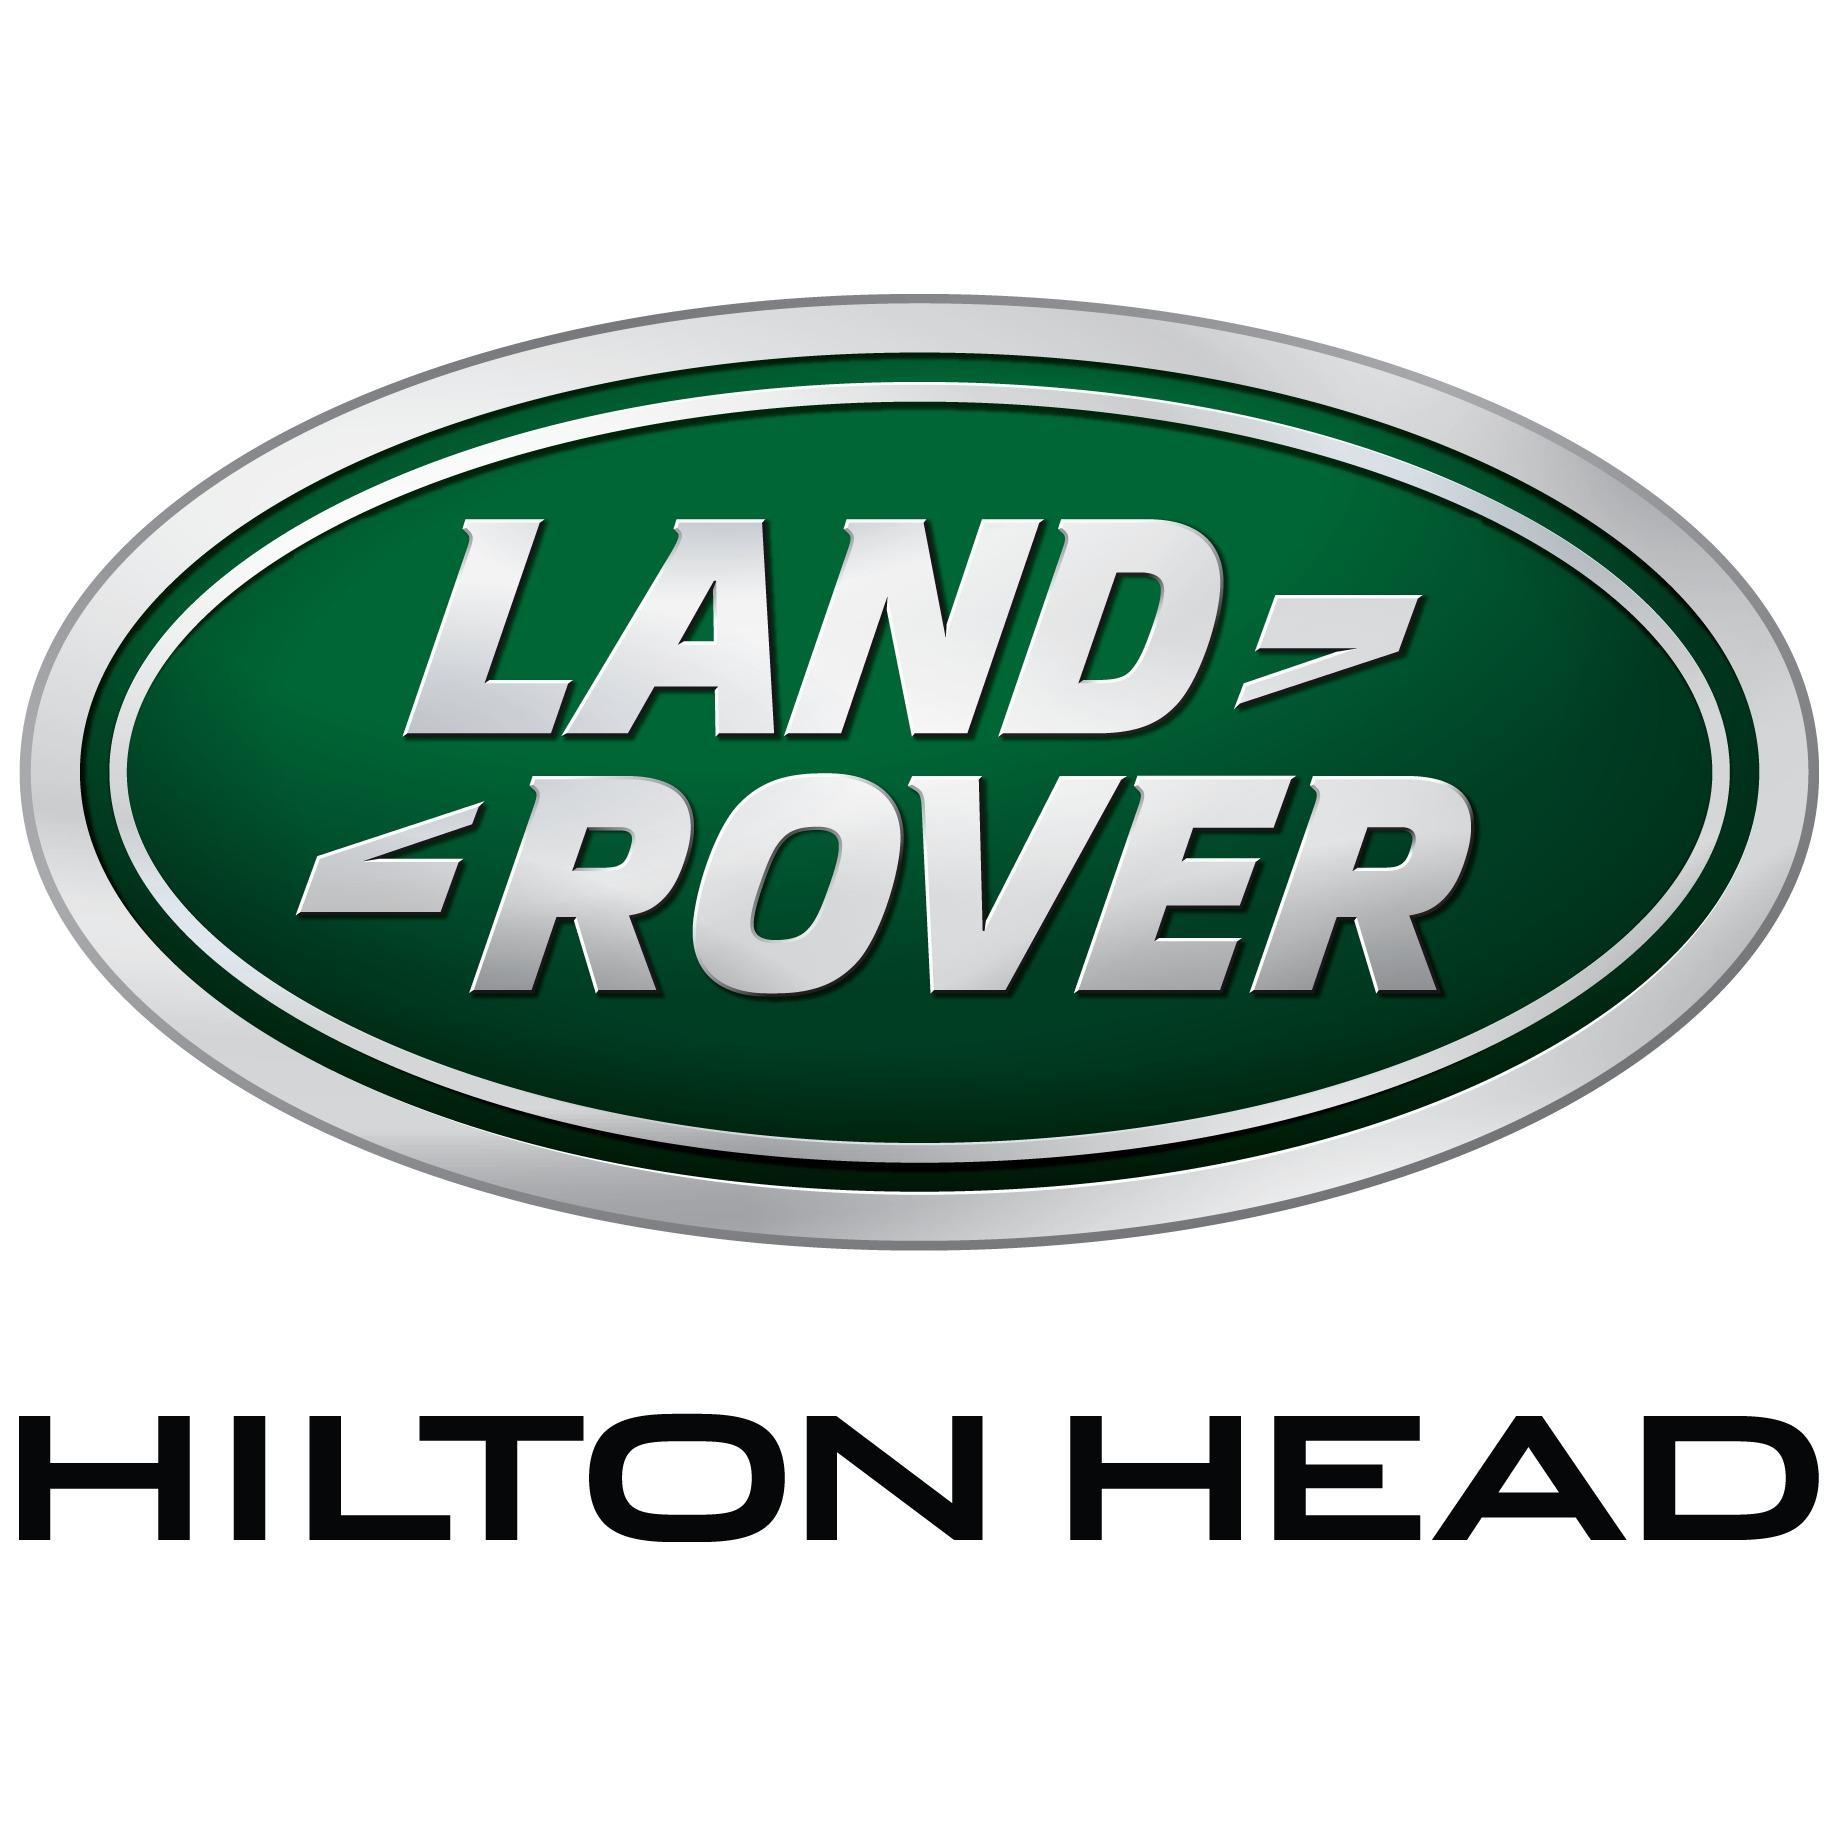 Land Rover Hilton Head